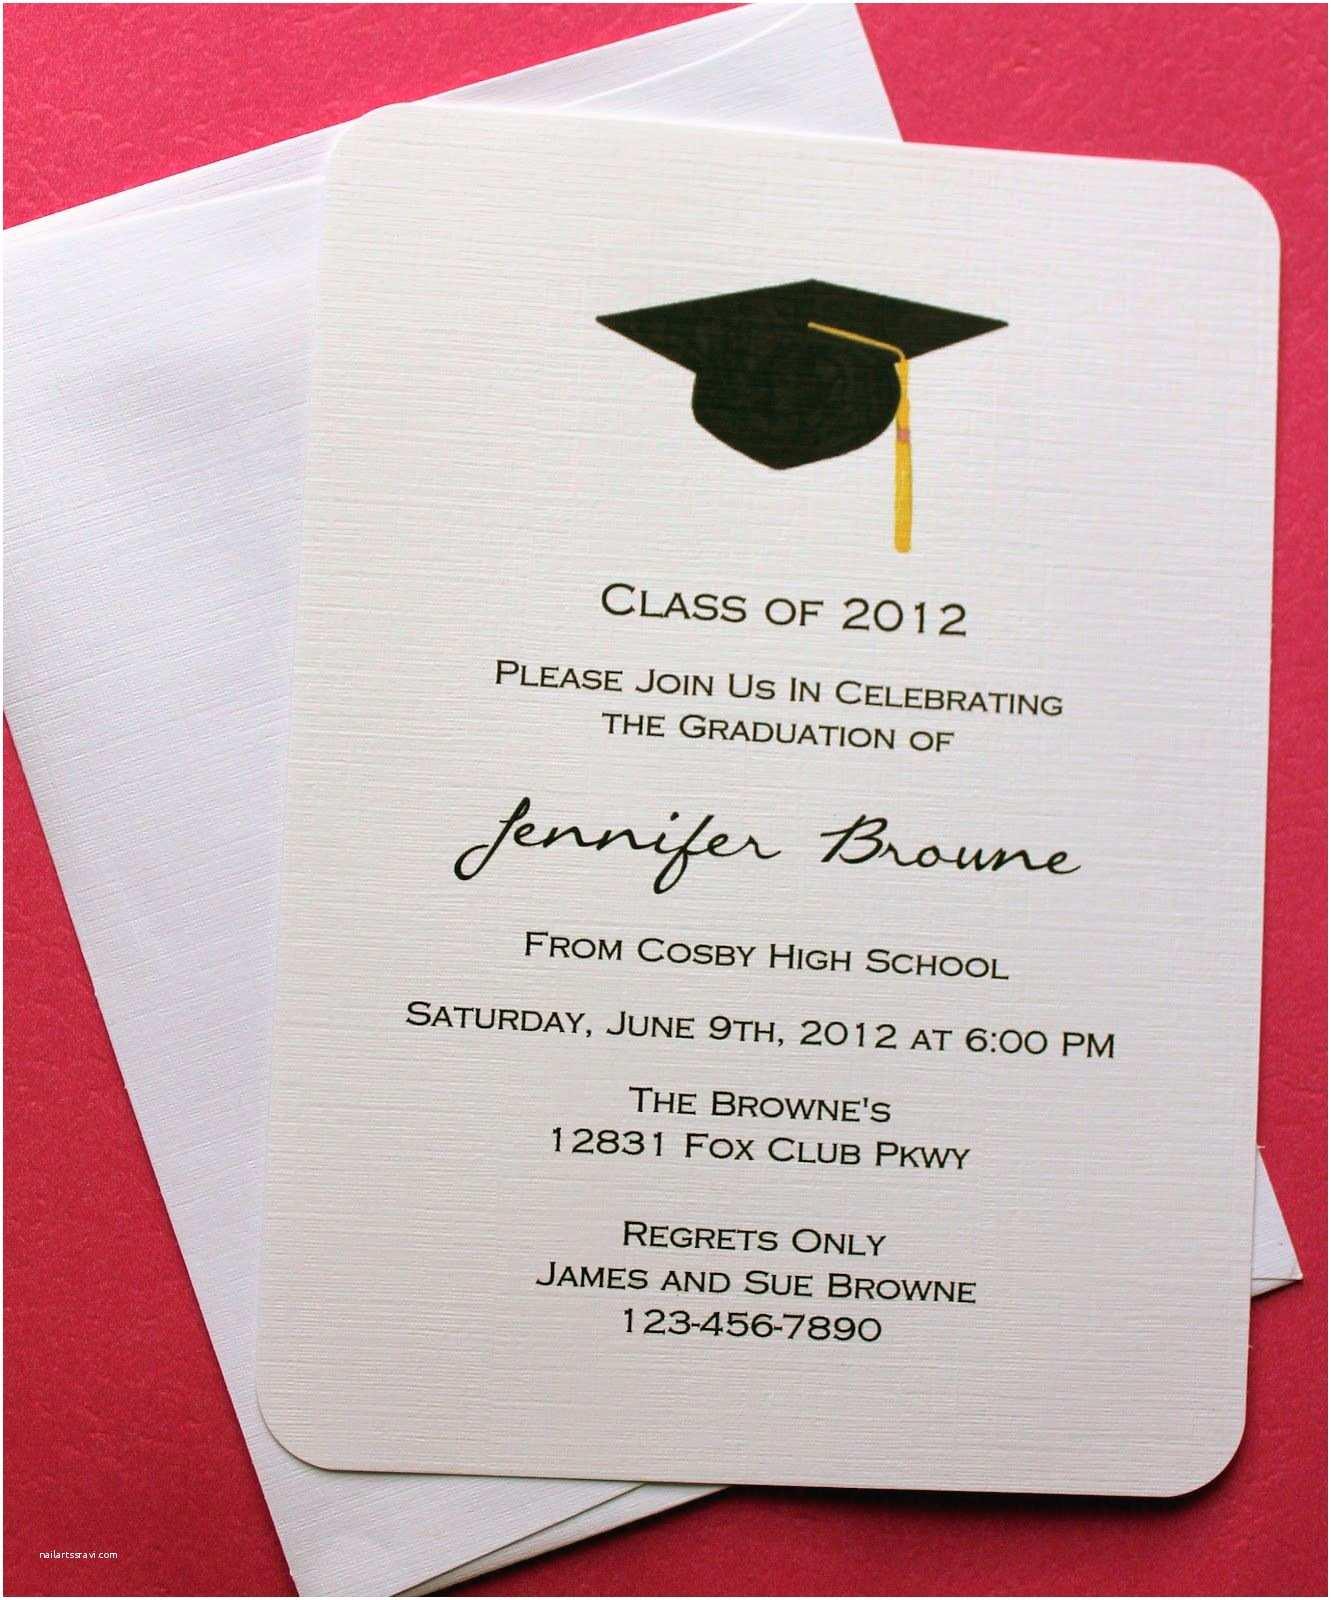 College Graduation Invitation Templates Graduation Invitation Template Graduation Invitation